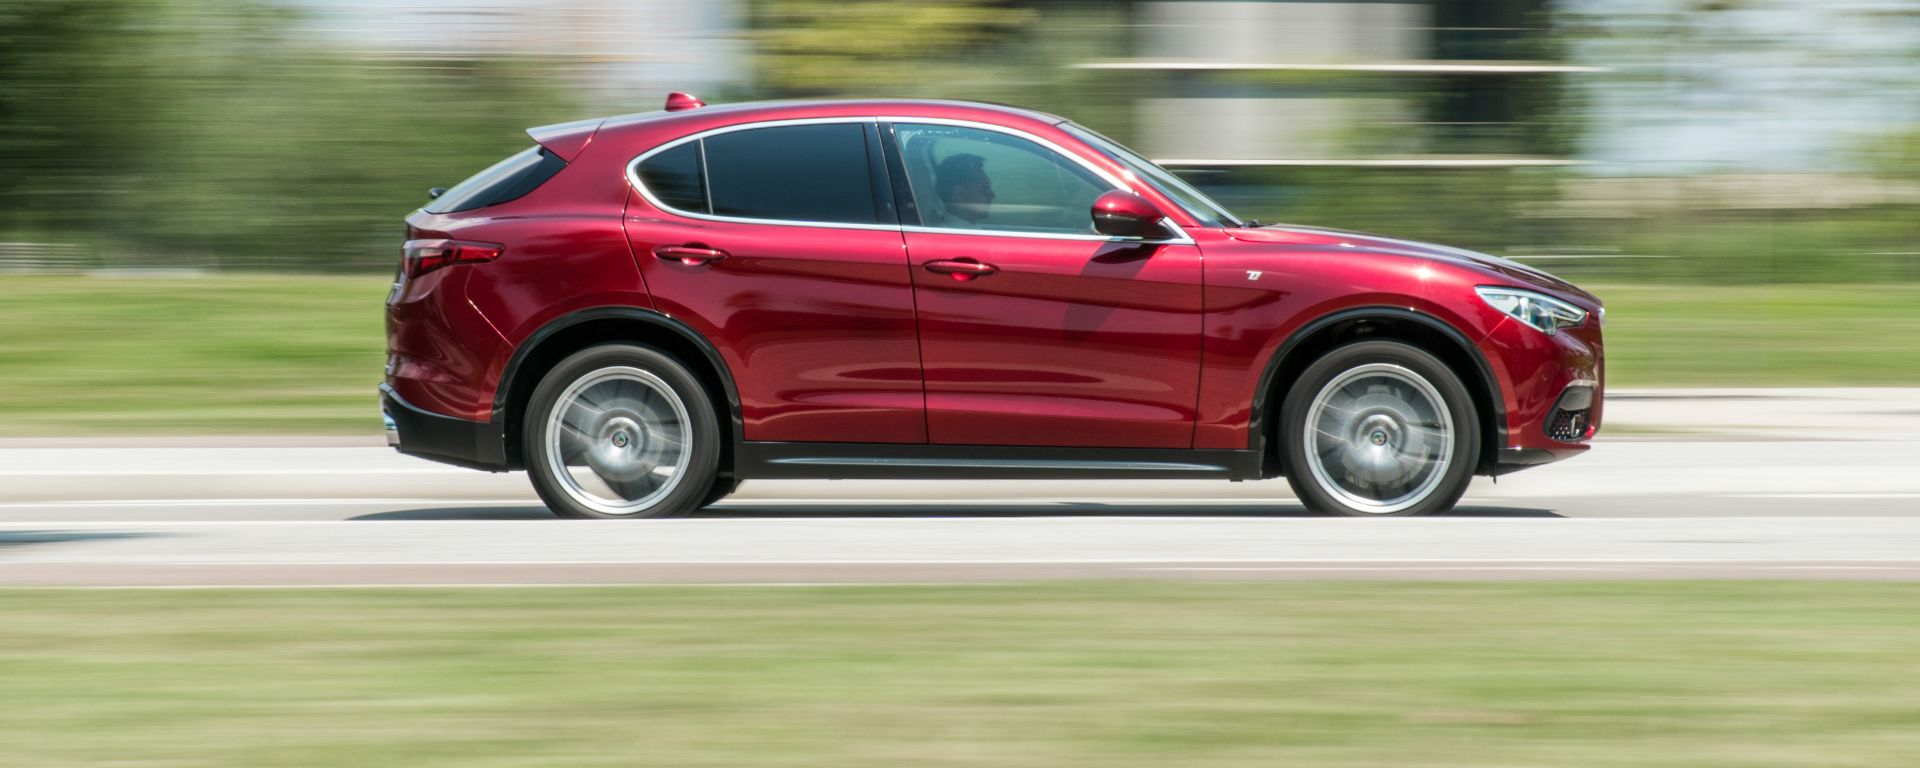 Alfa Romeo Stelvio 200 CV benzina Ti: profilo inconfondibile